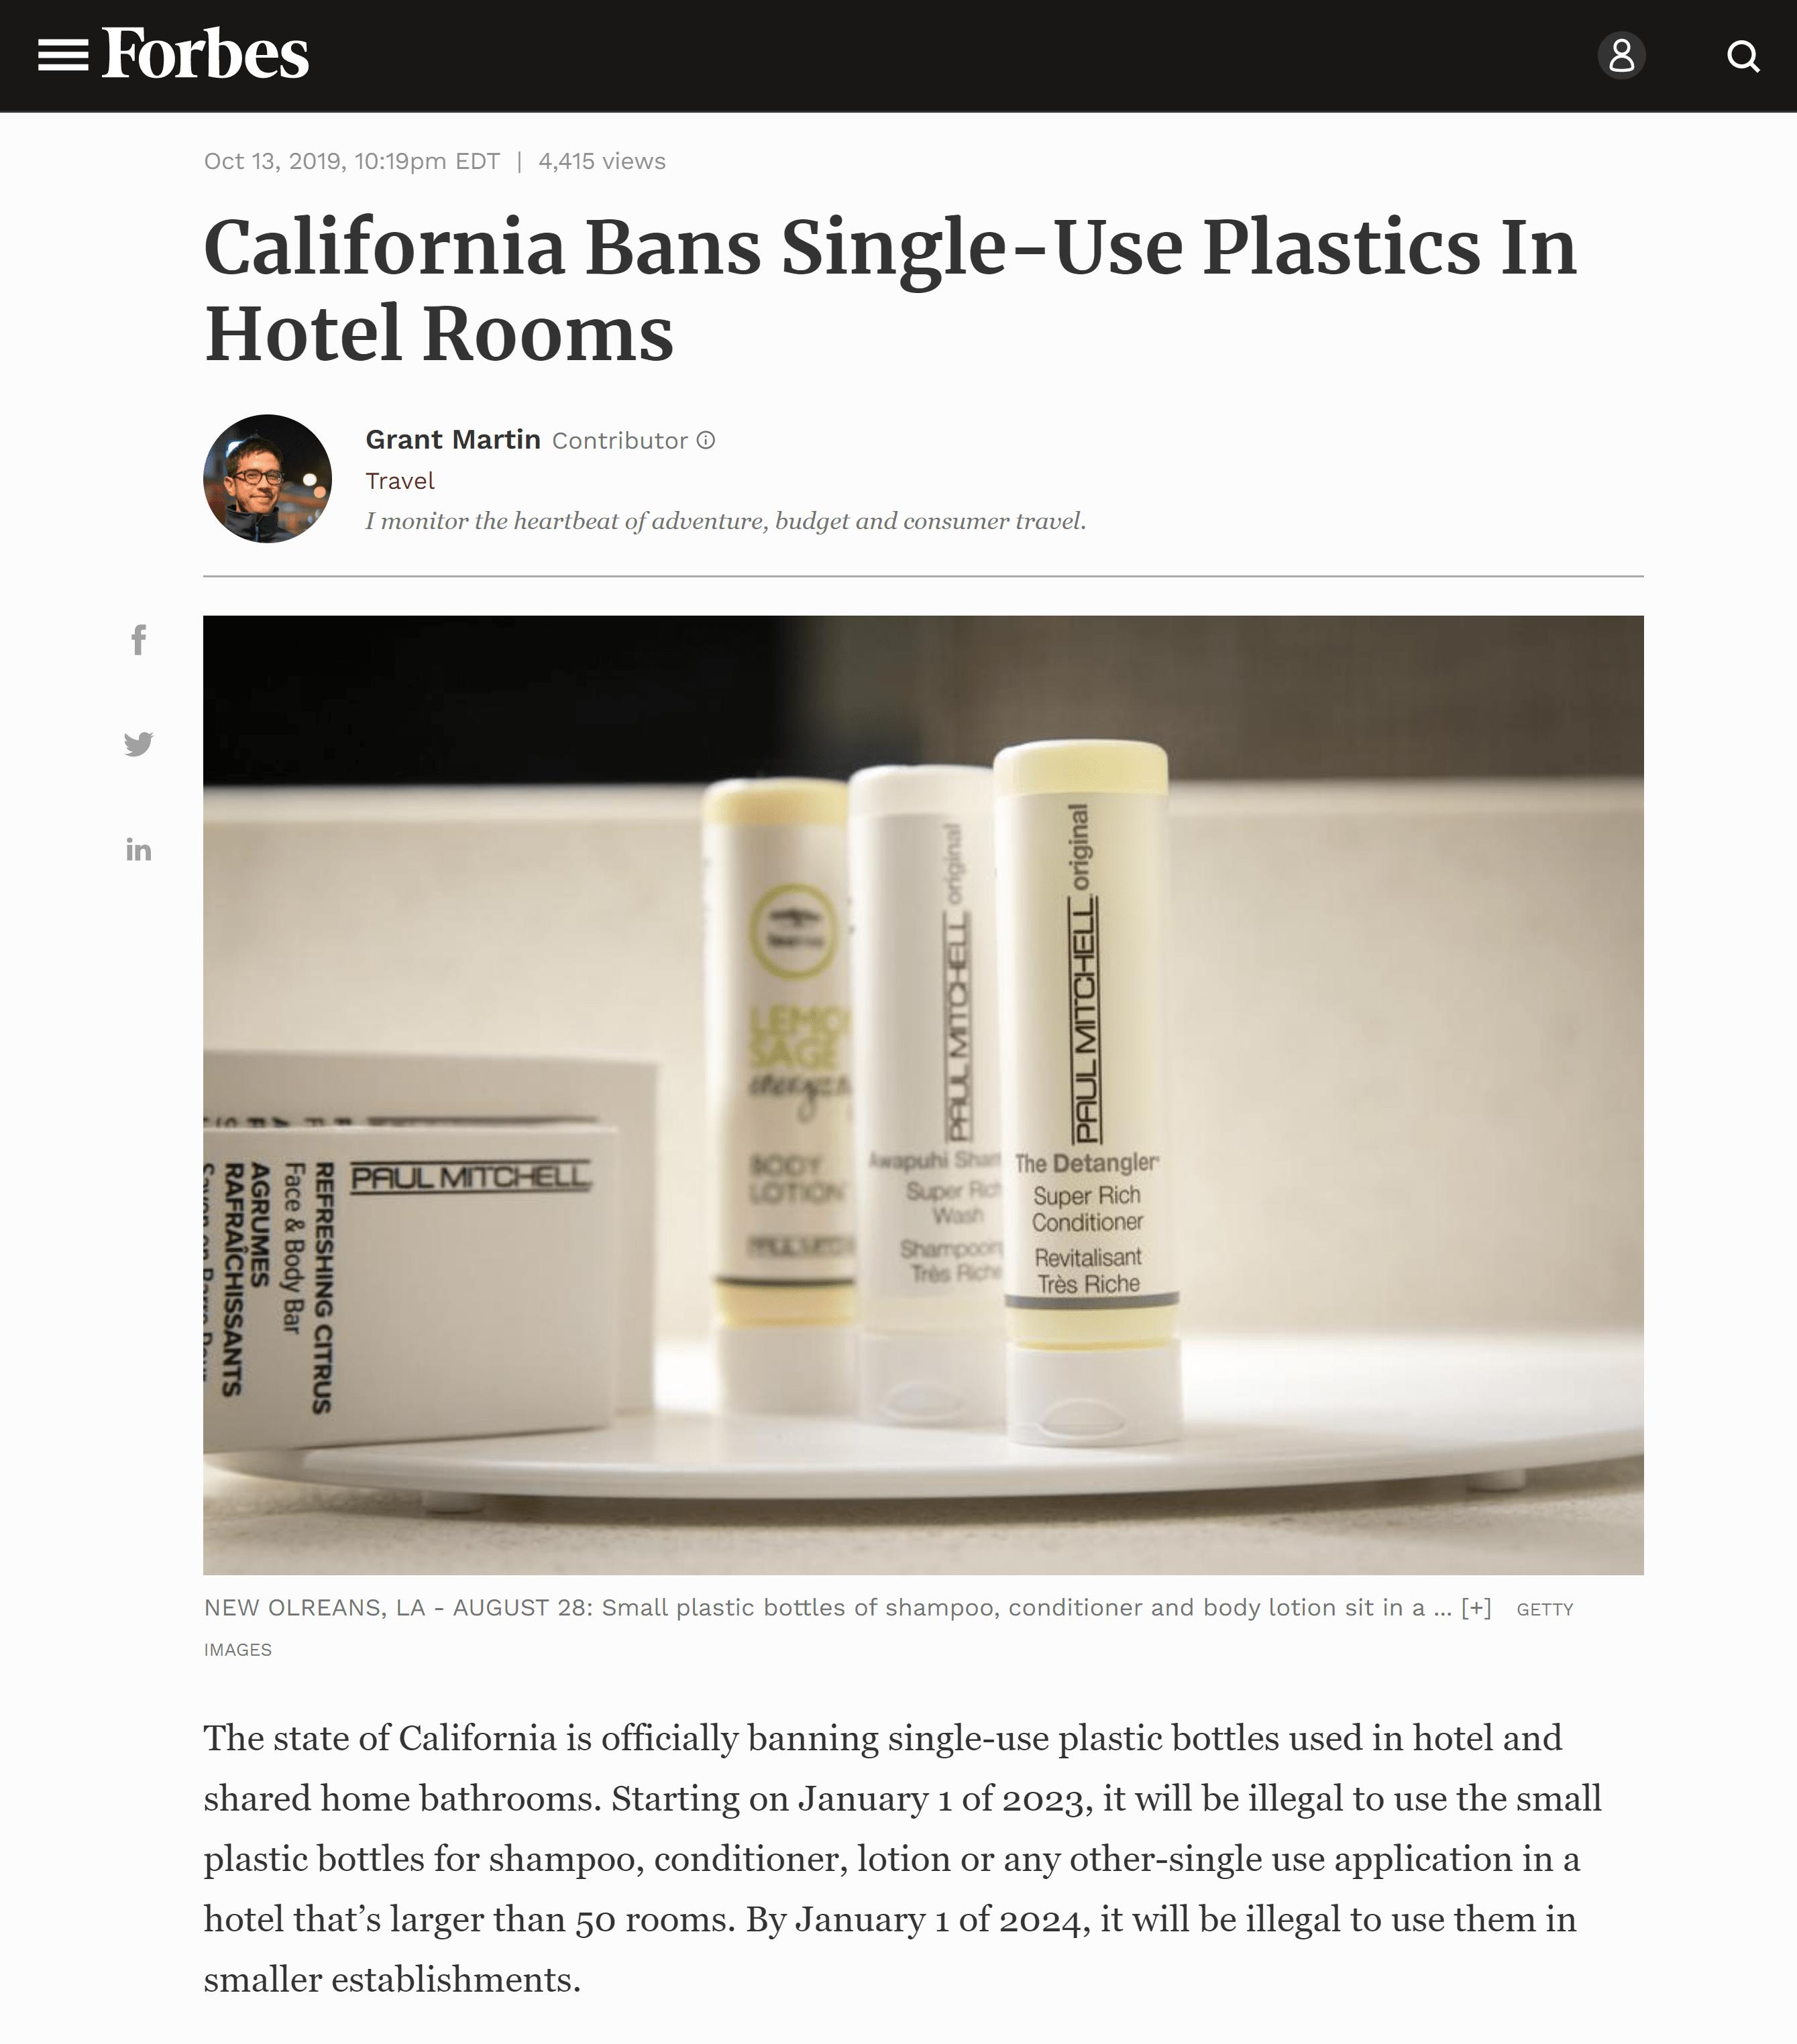 forbes-california-bans-single-use-pla...